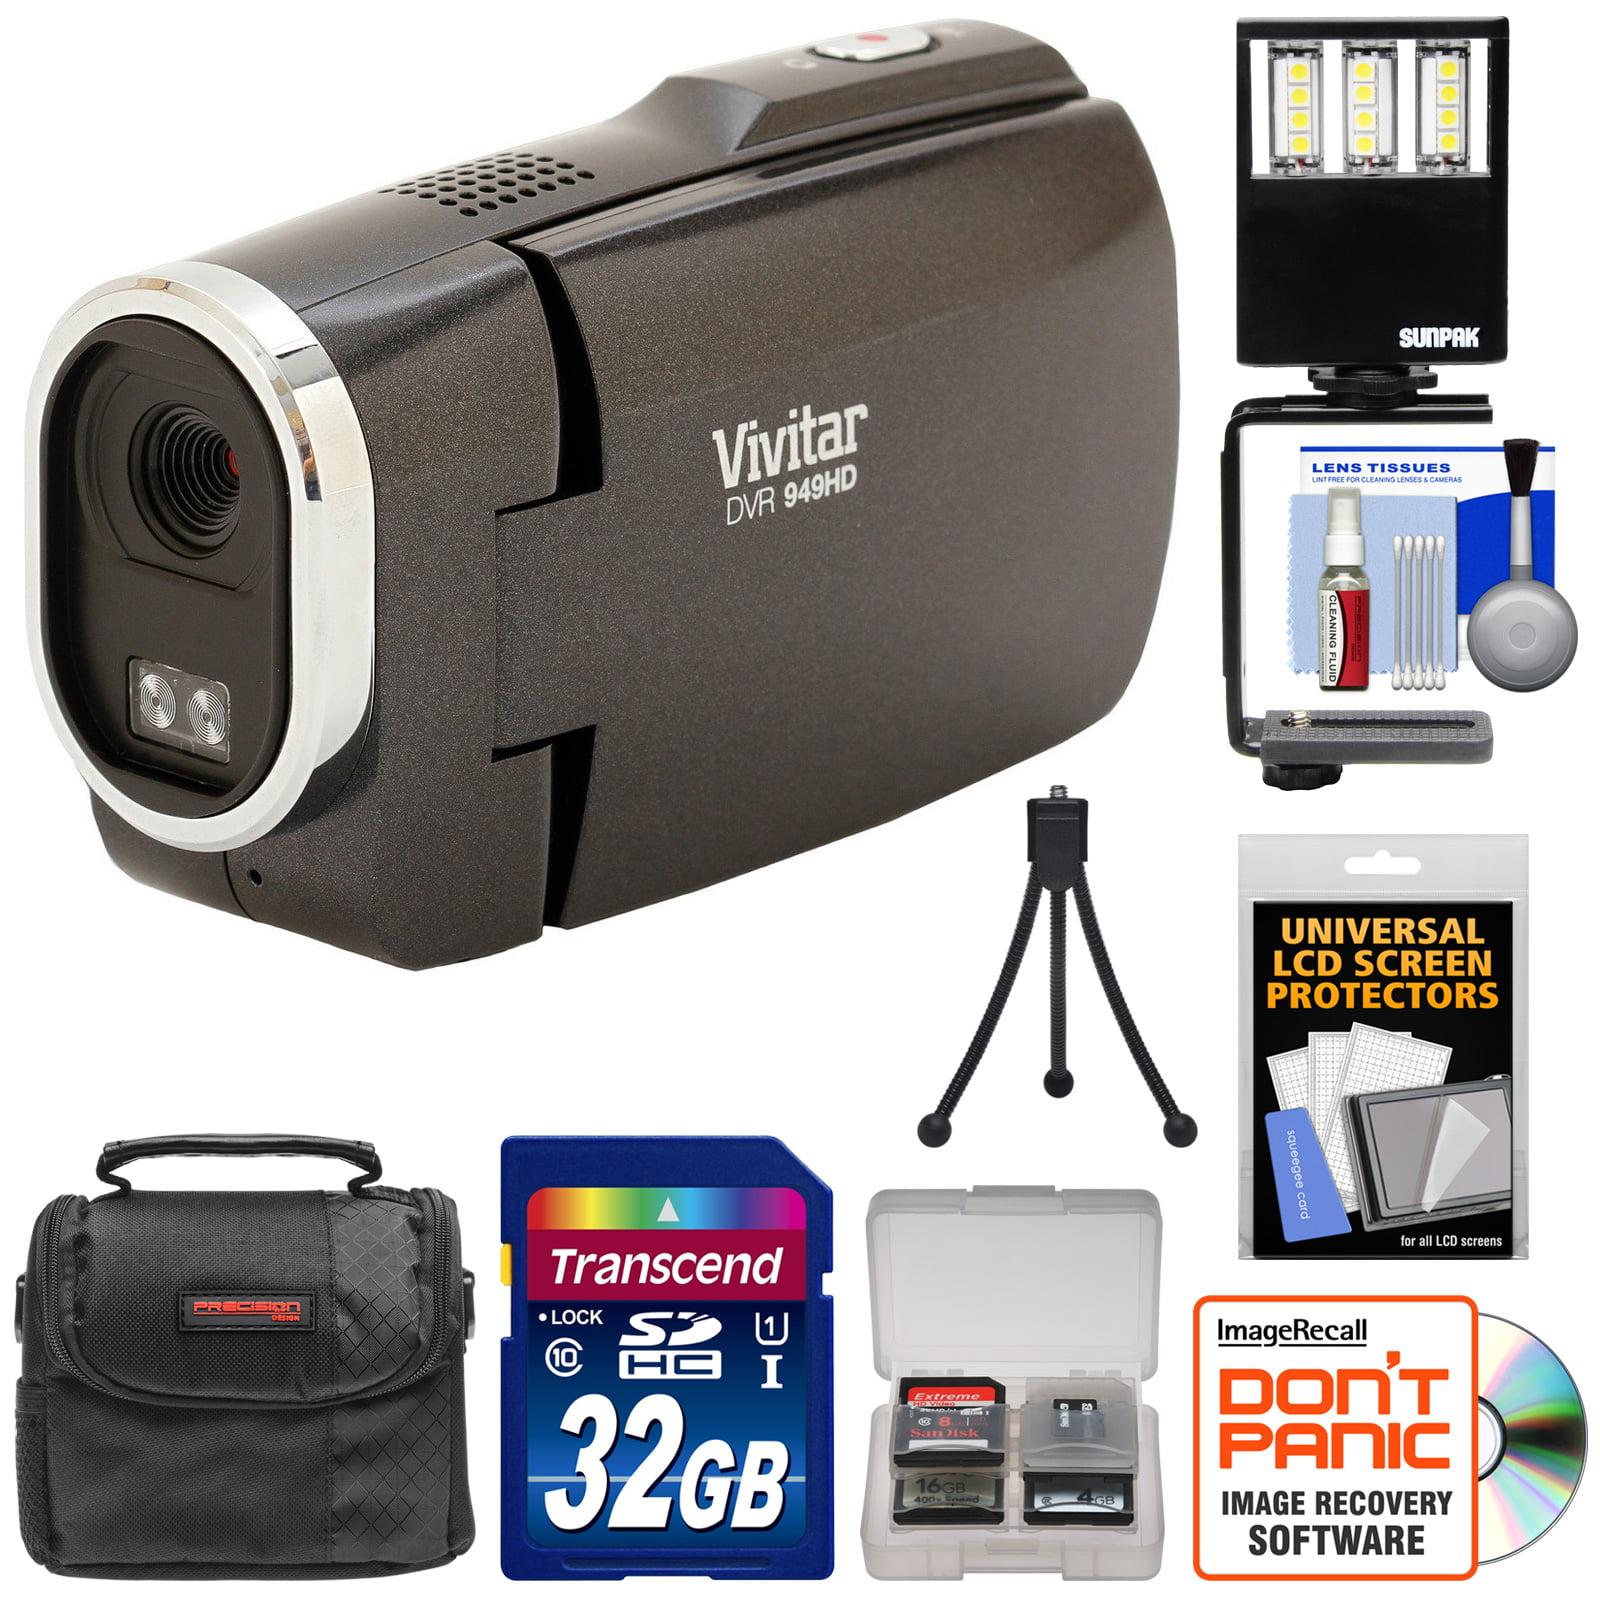 Vivitar DVR949HD 1080p HD Video Camera Camcorder (Black) ...